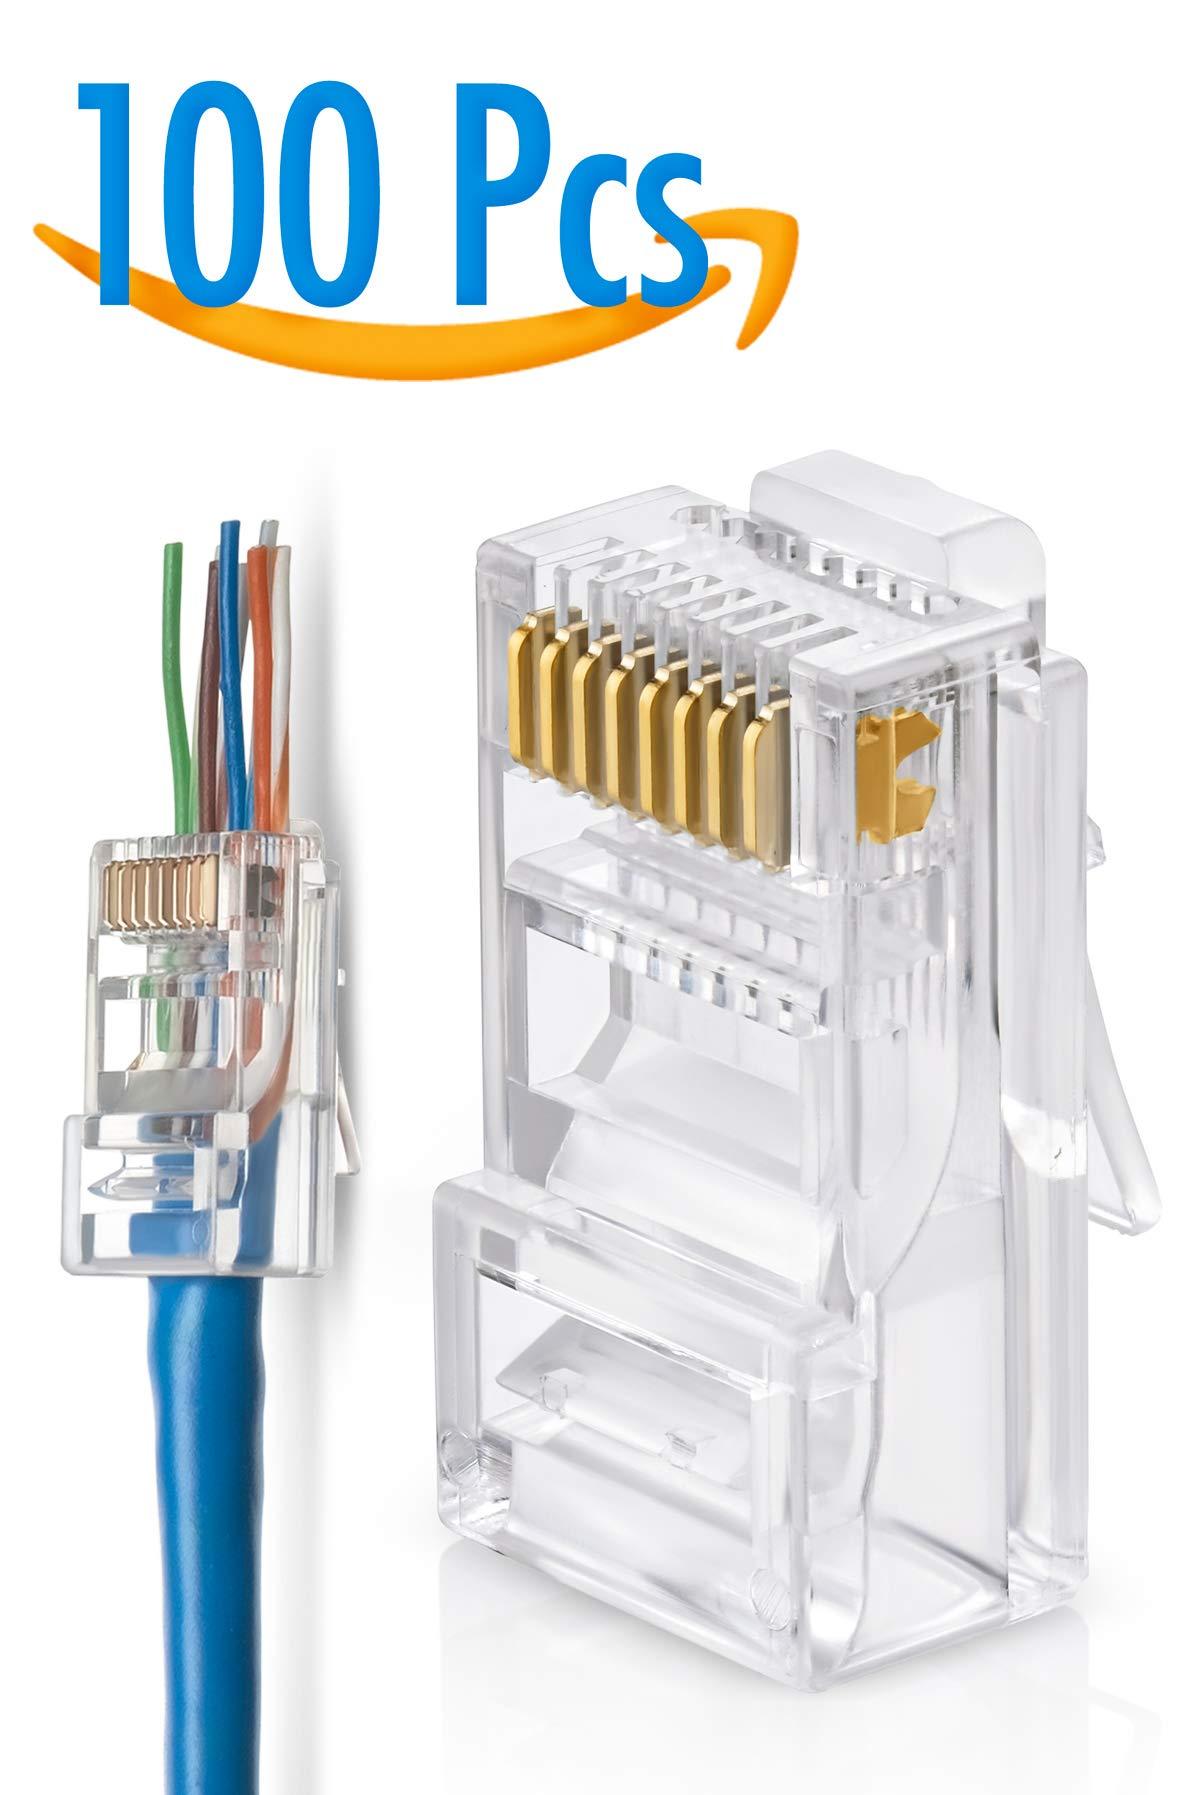 RJ45 Cat5 Cat5e Pass Through Connectors Pack of 100 | EZ Crimp Connector UTP Network Unshielded Plug for Twisted Pair Solid Wire & Standard Cables | Transparent Passthrough Ethernet Insert by GTZ